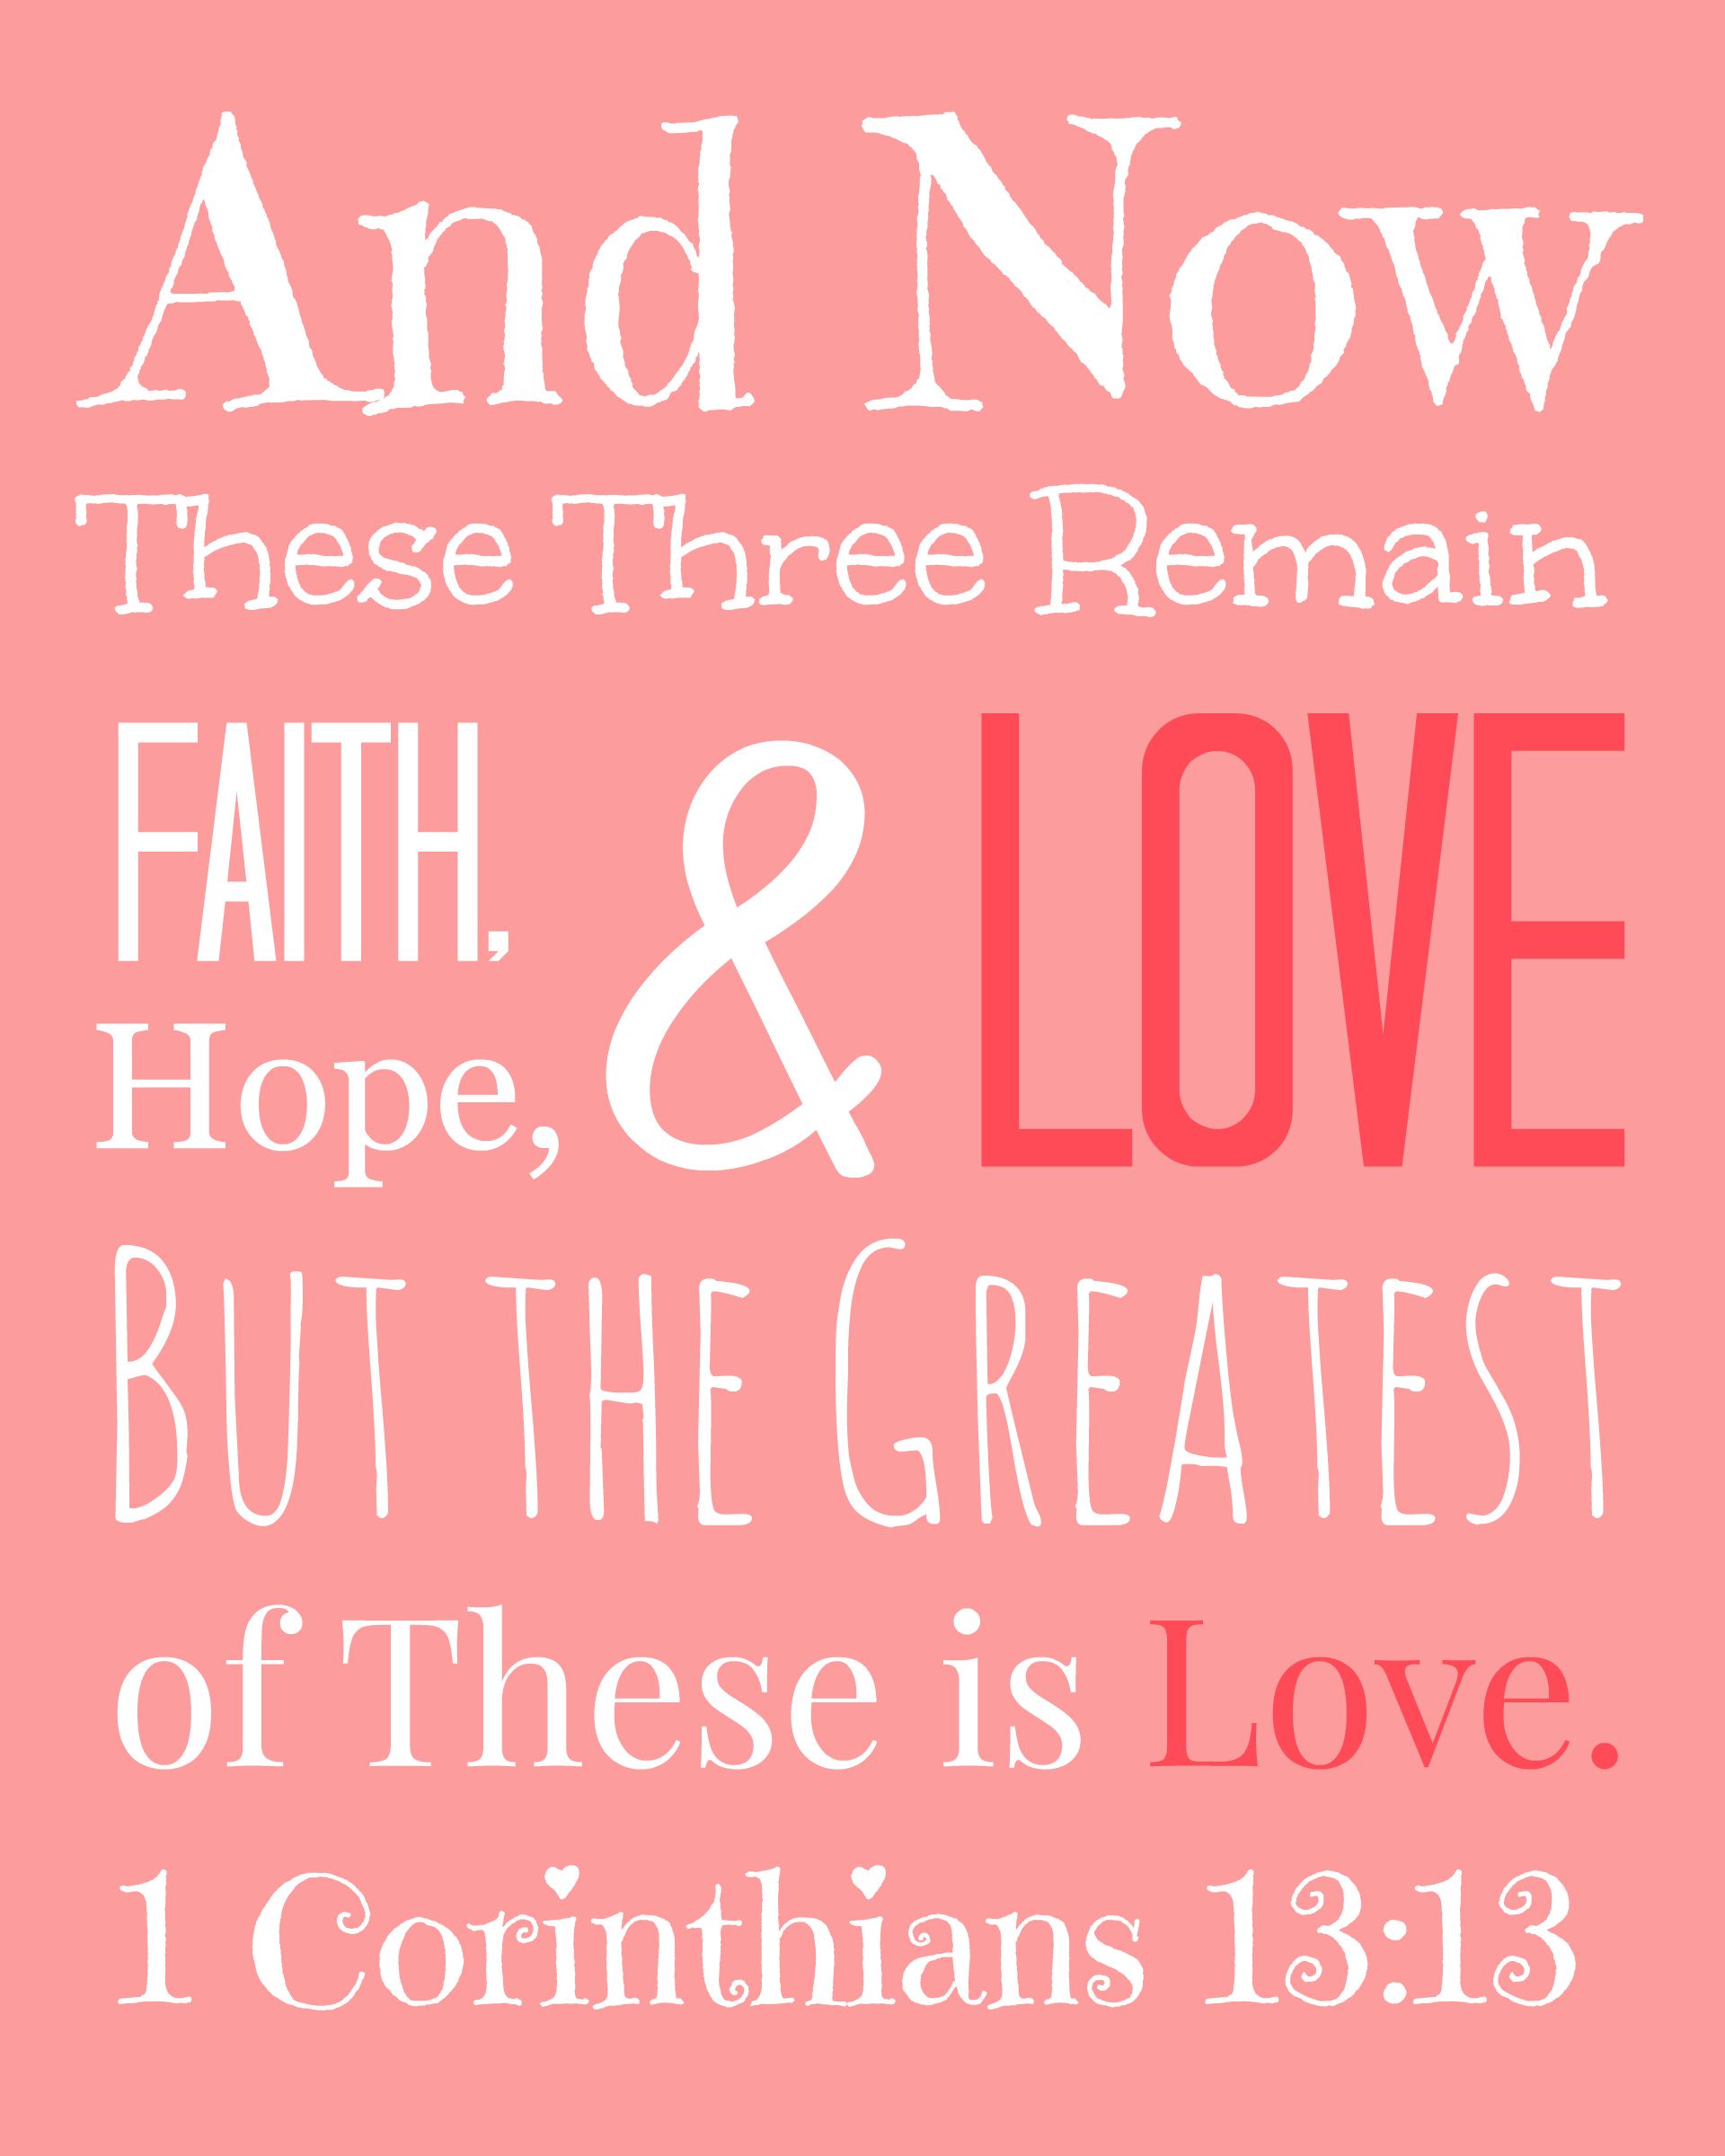 Best Images of Printable Love Bible Verses - Valentine Love ...